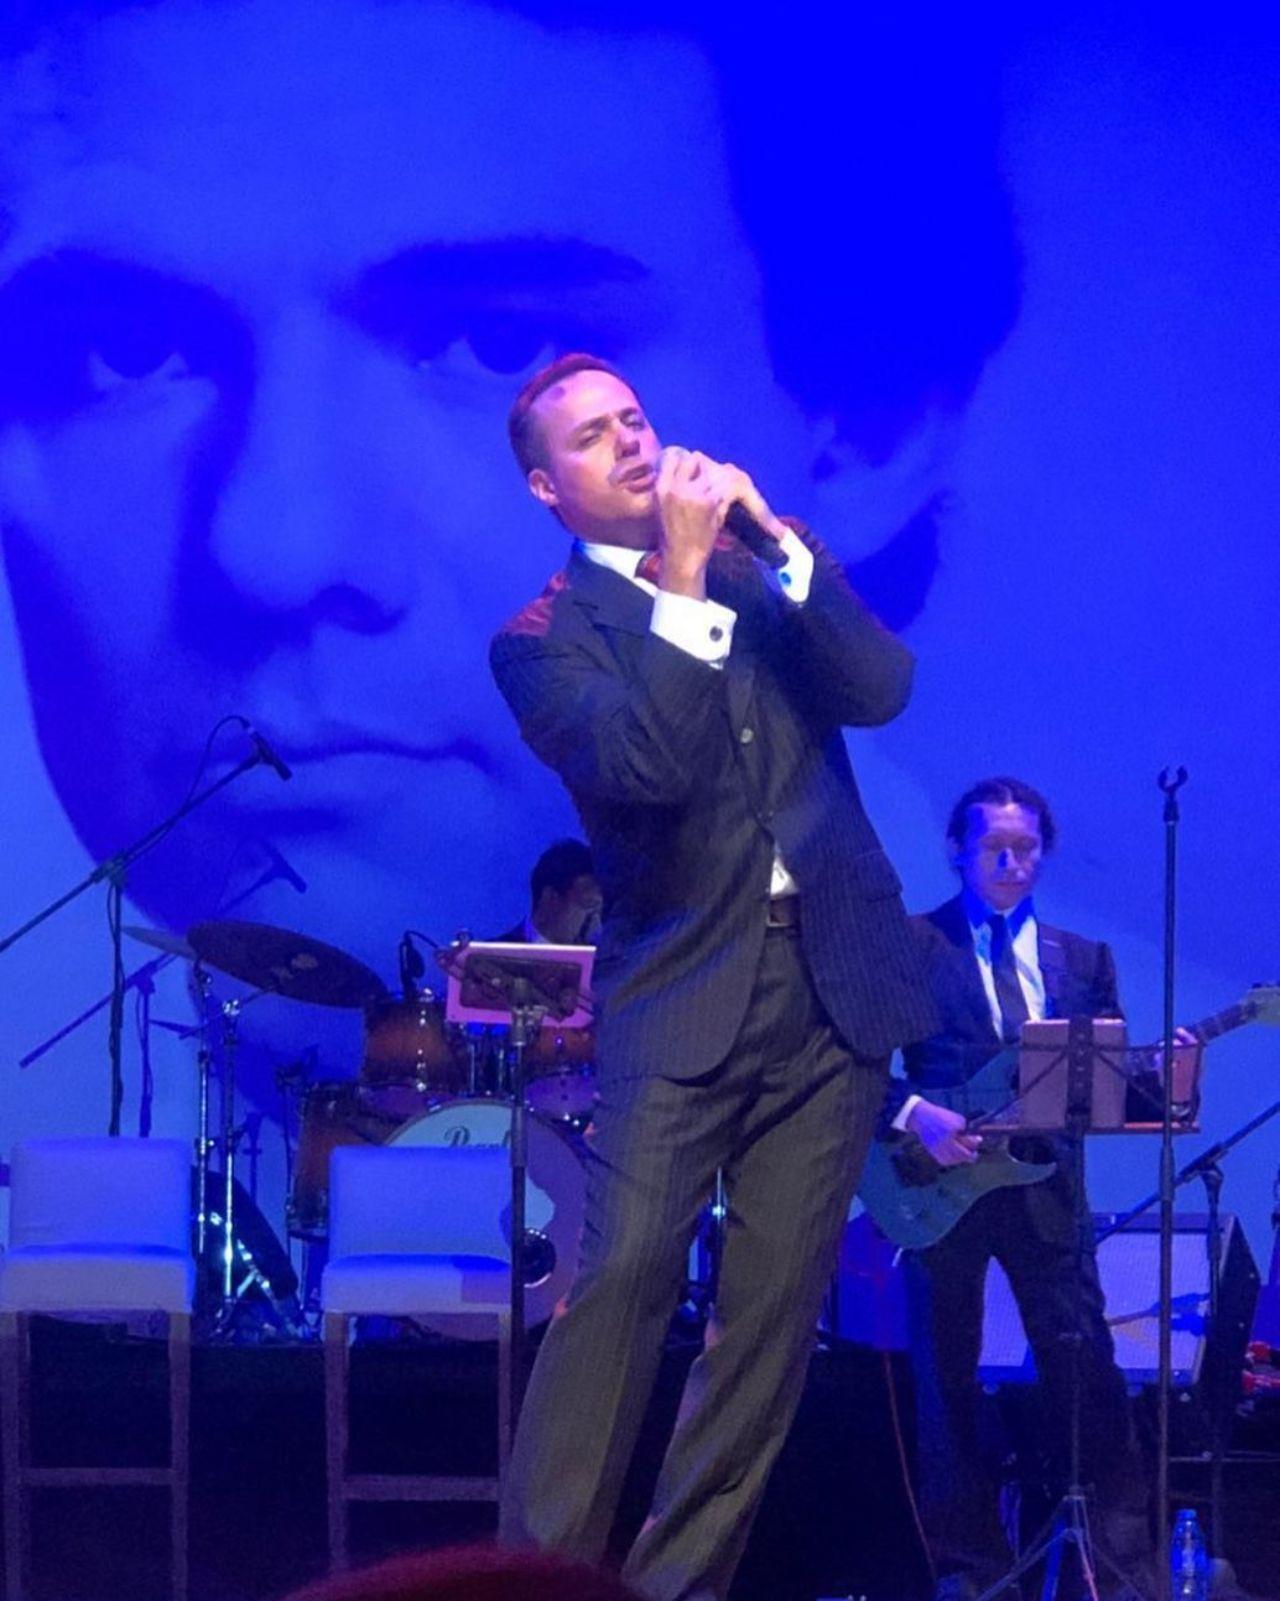 Jose Joel en un show cantando